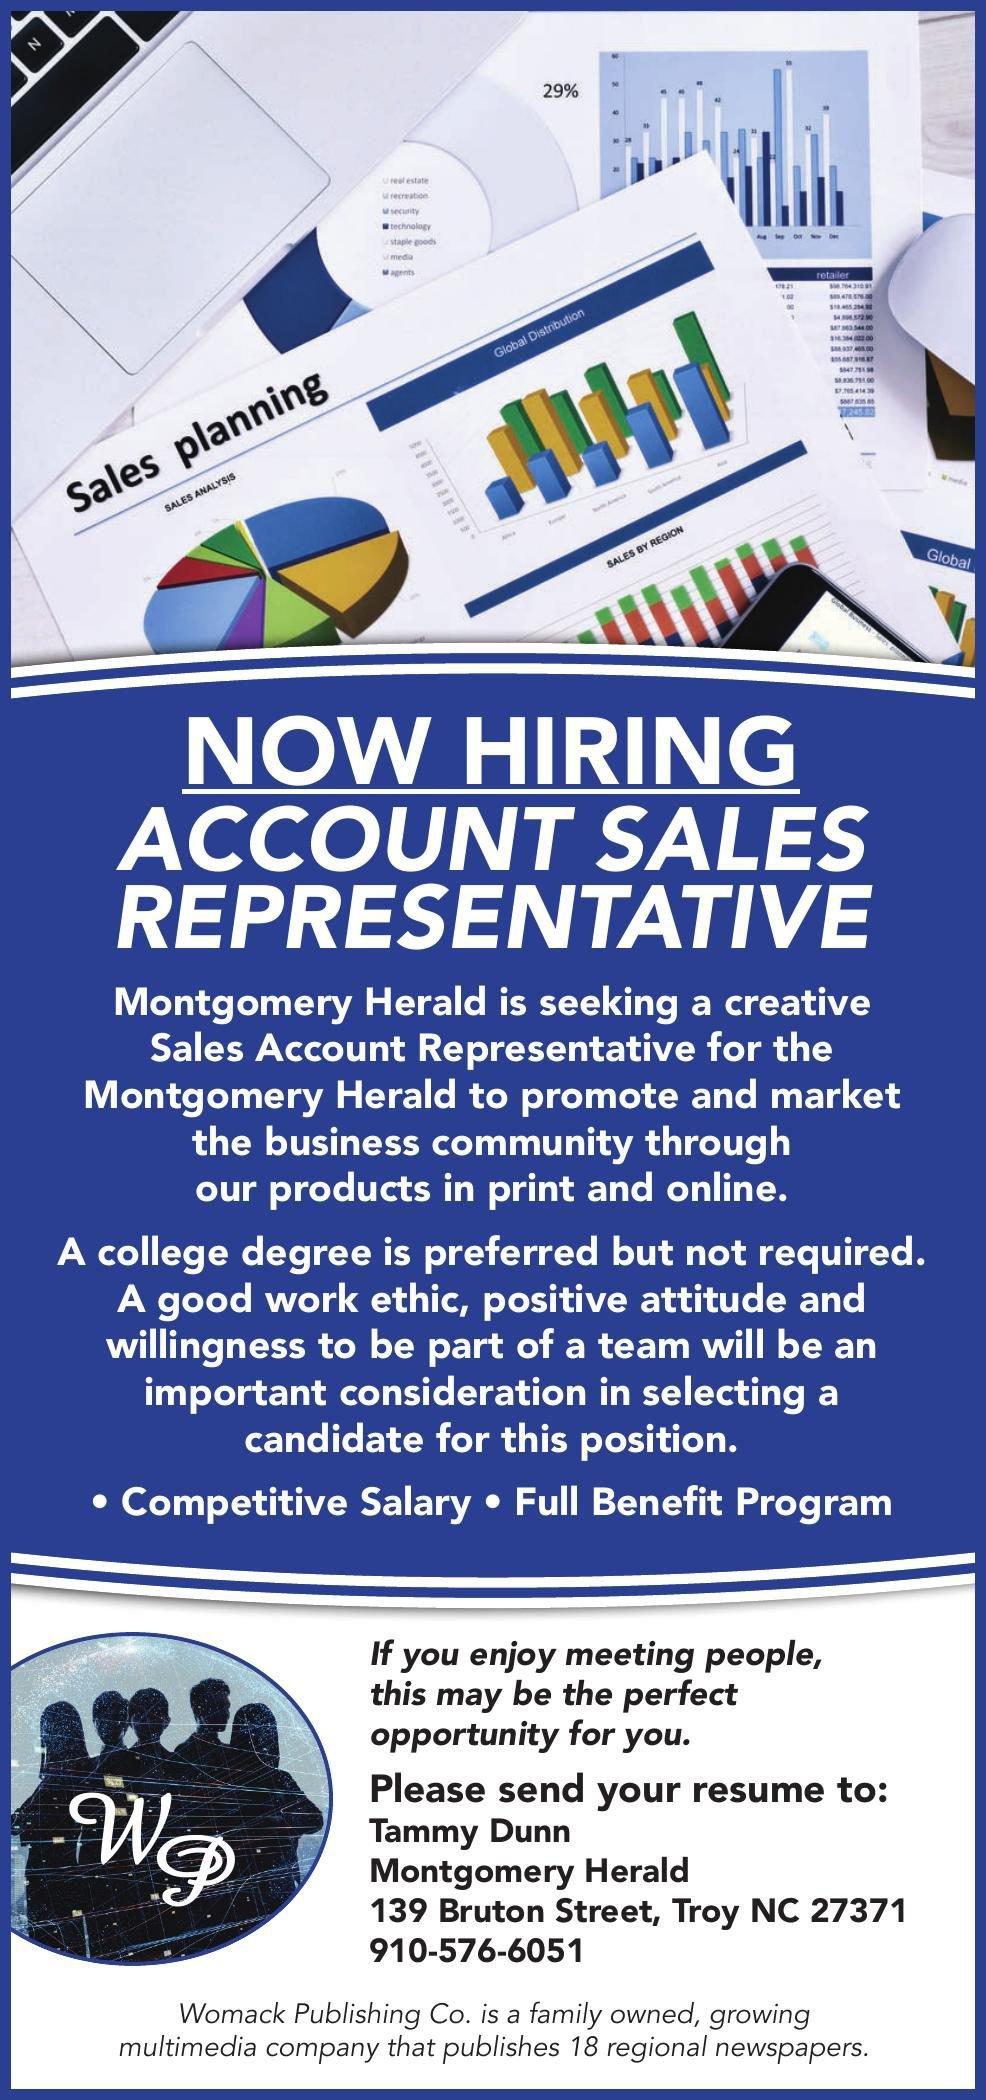 Montgomery Herald is Hiring for Account Sales Representative